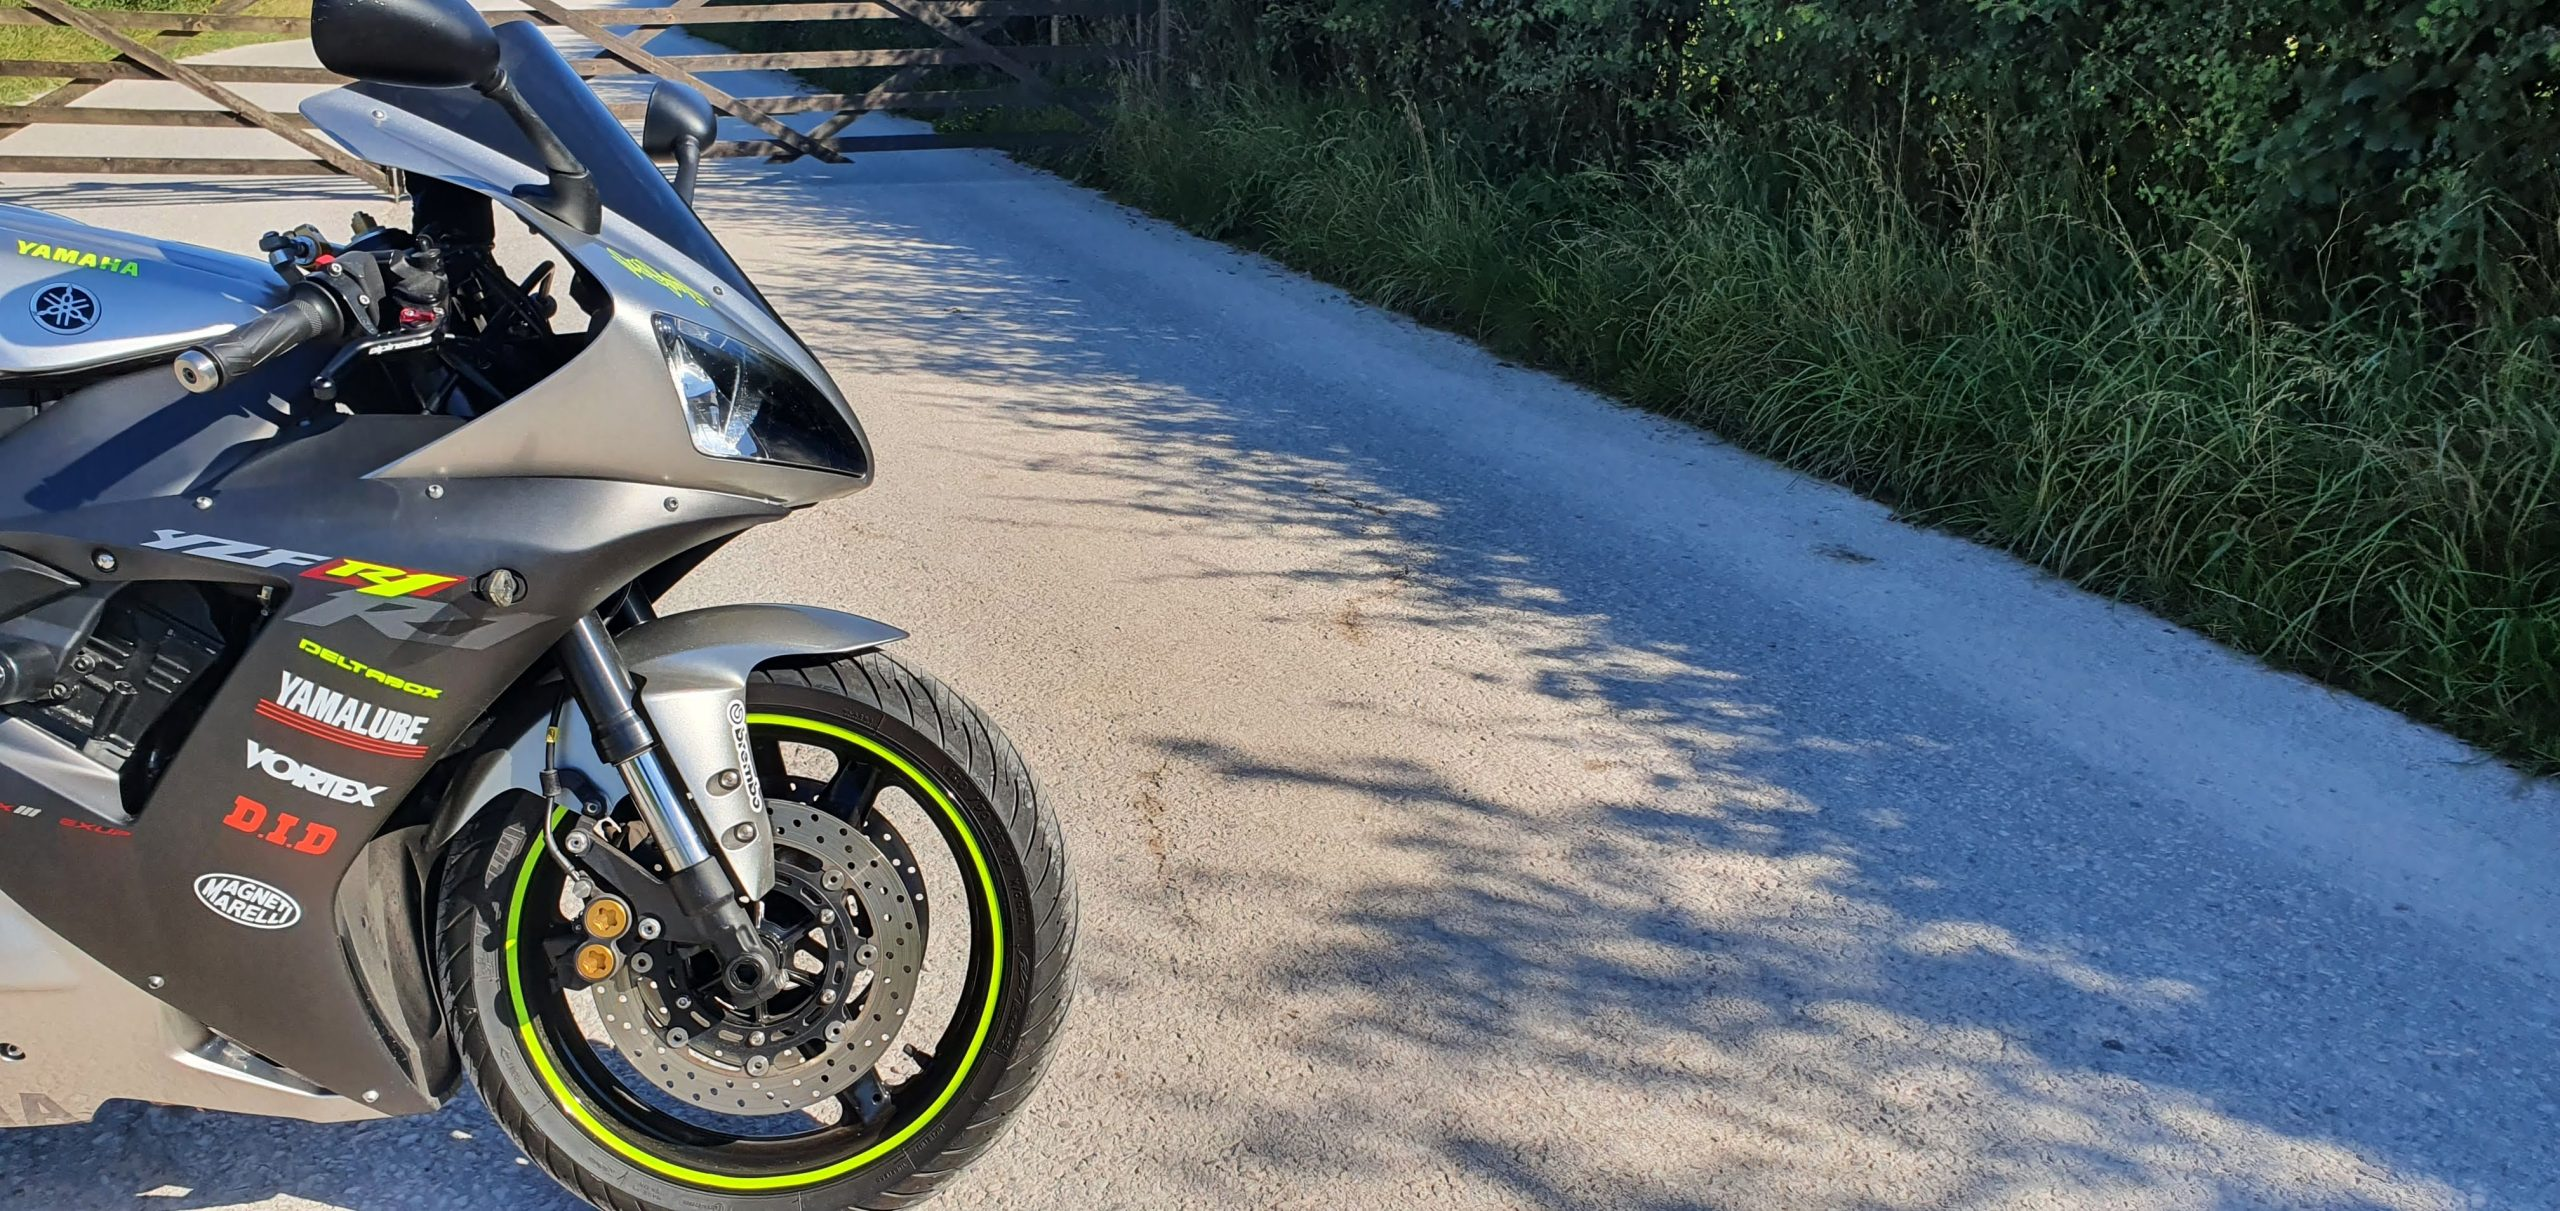 Used Bike Review: Yamaha R1 (2002 – 2003)